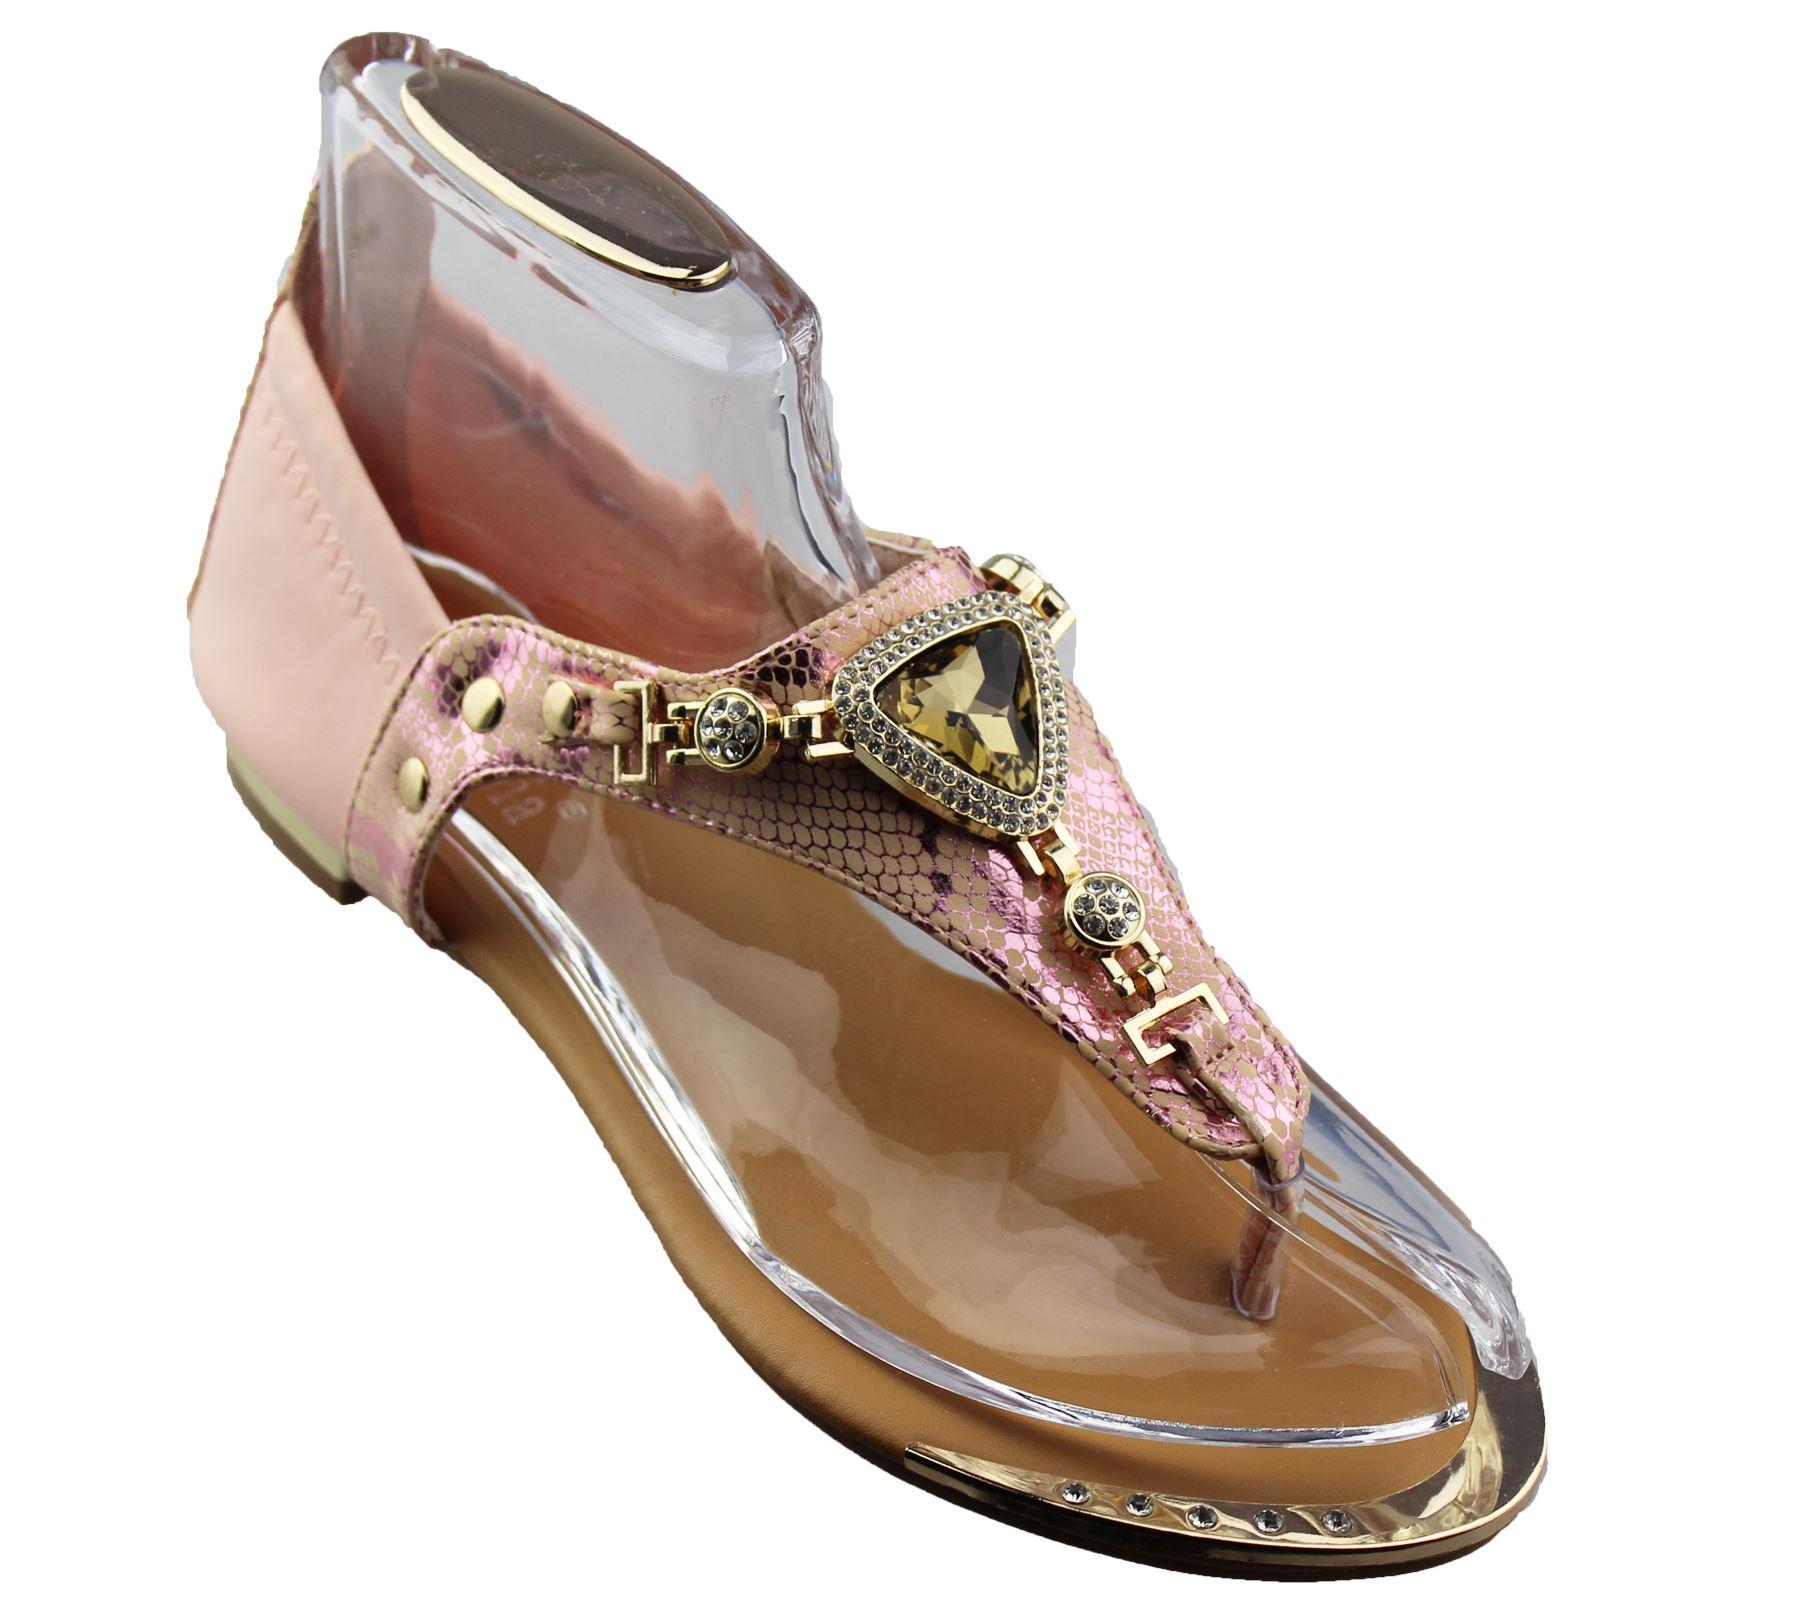 Womens-Flat-Summer-Sandals-Ladies-Diamante-Wedding-Toe-Post-Casual-Slipper thumbnail 32